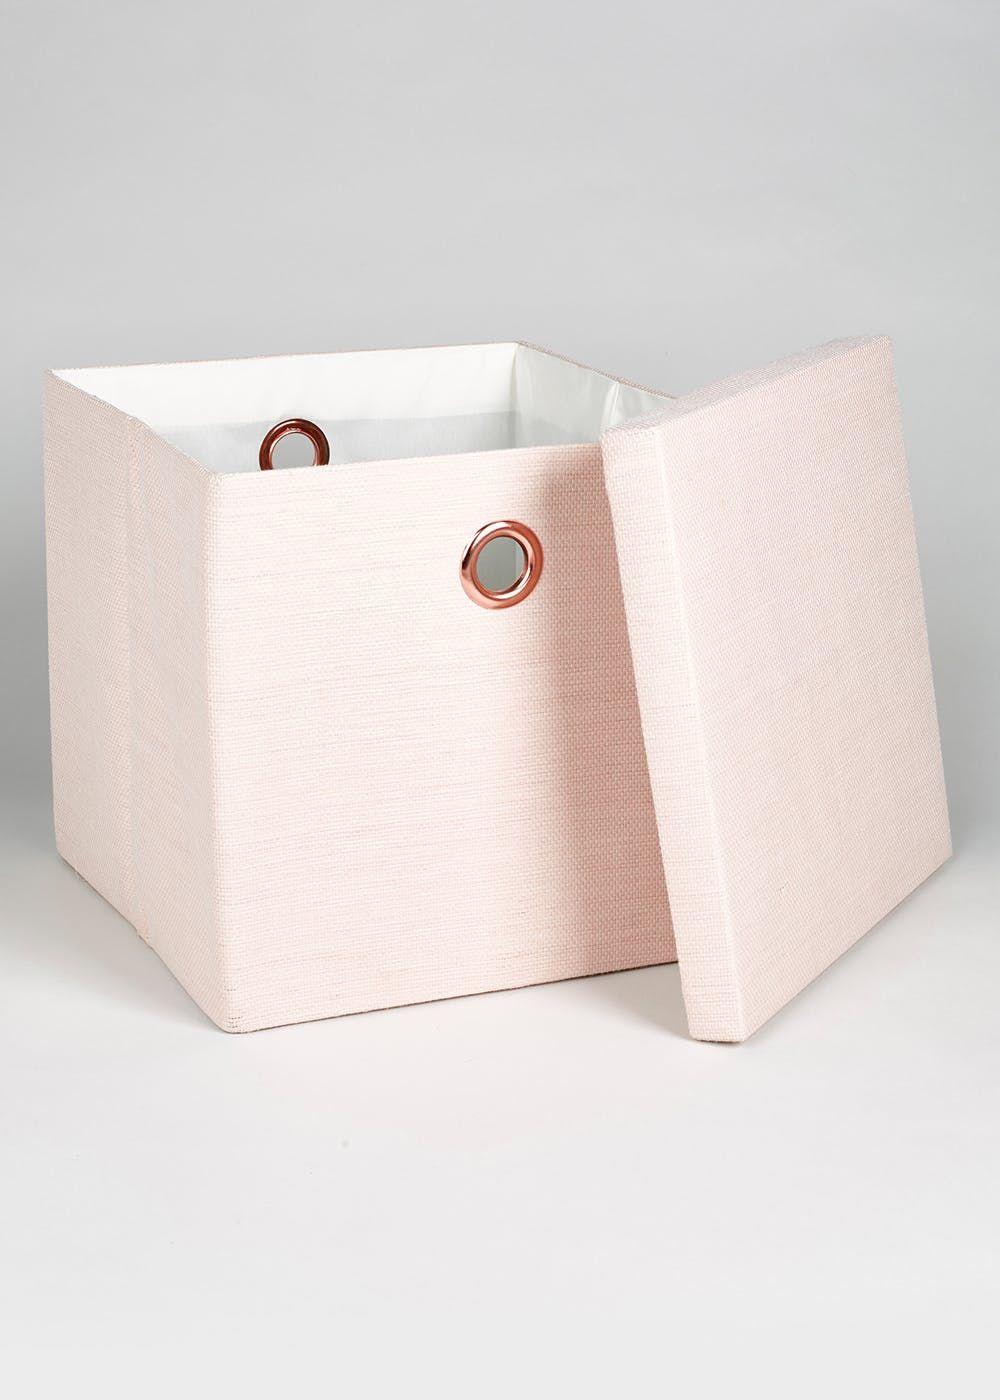 Foldable Fabric Storage Box 32cm X 32cm X 32cm Pink Fabric Storage Boxes Pink Storage Boxes Bedroom Storage Boxes